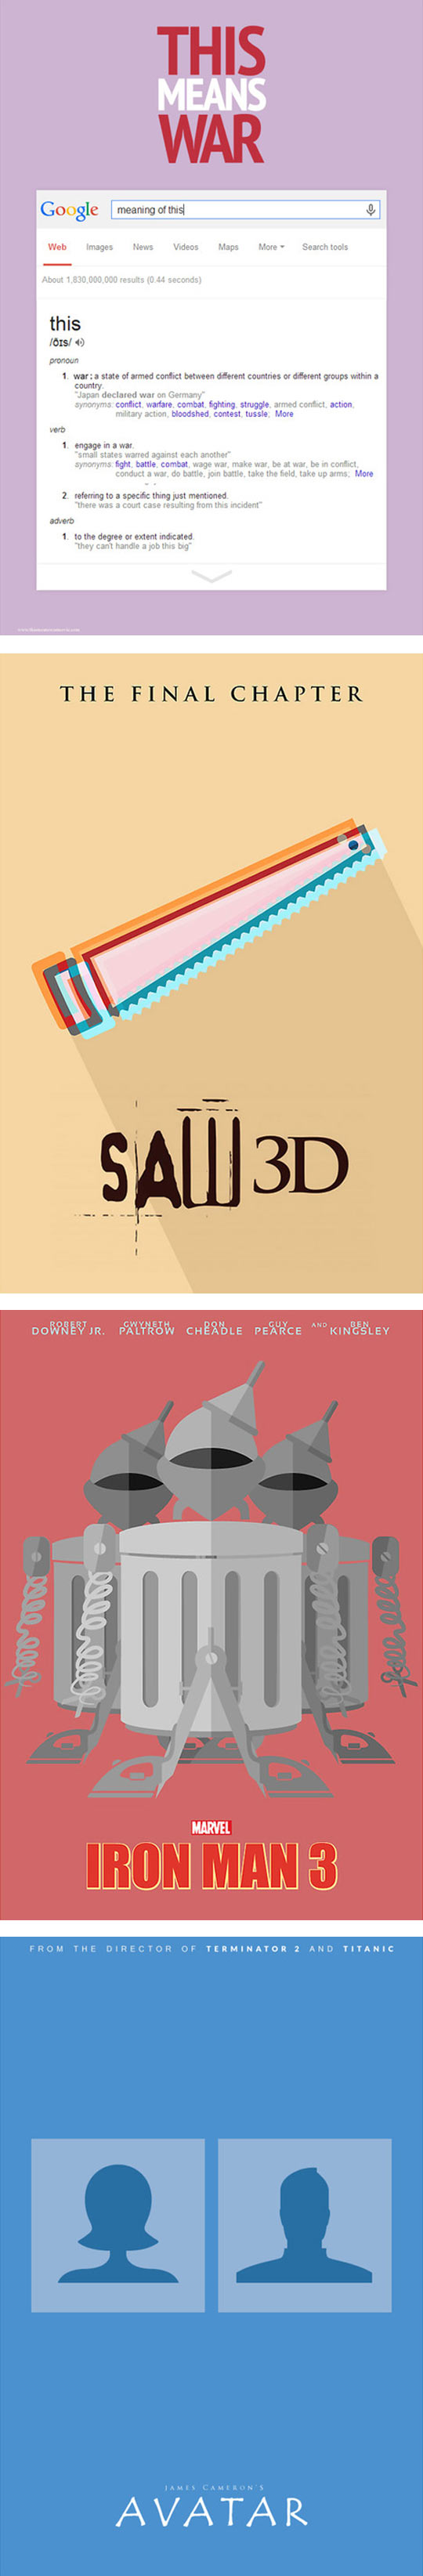 Creative Interpretation of movie posters